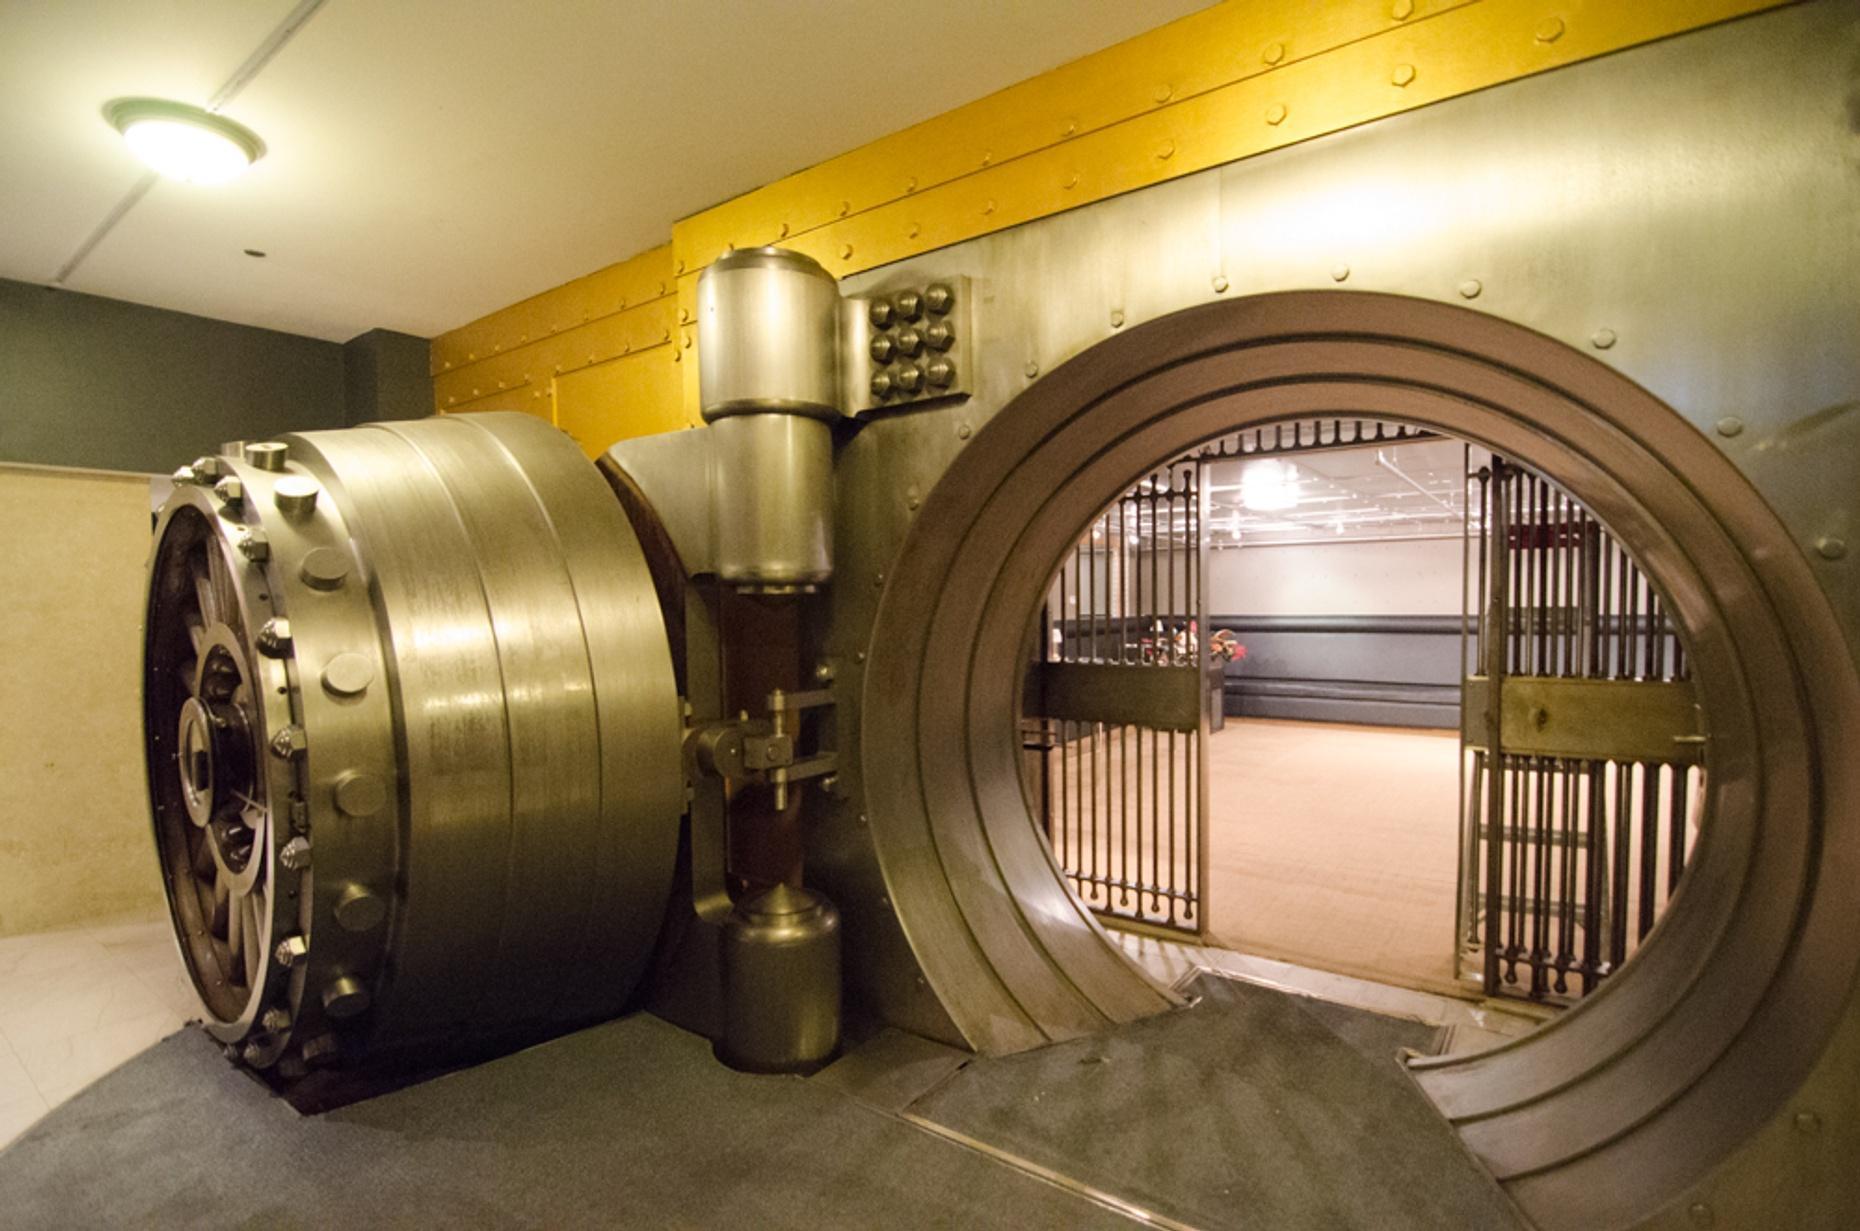 Bank Heist Escape Game in Pensacola